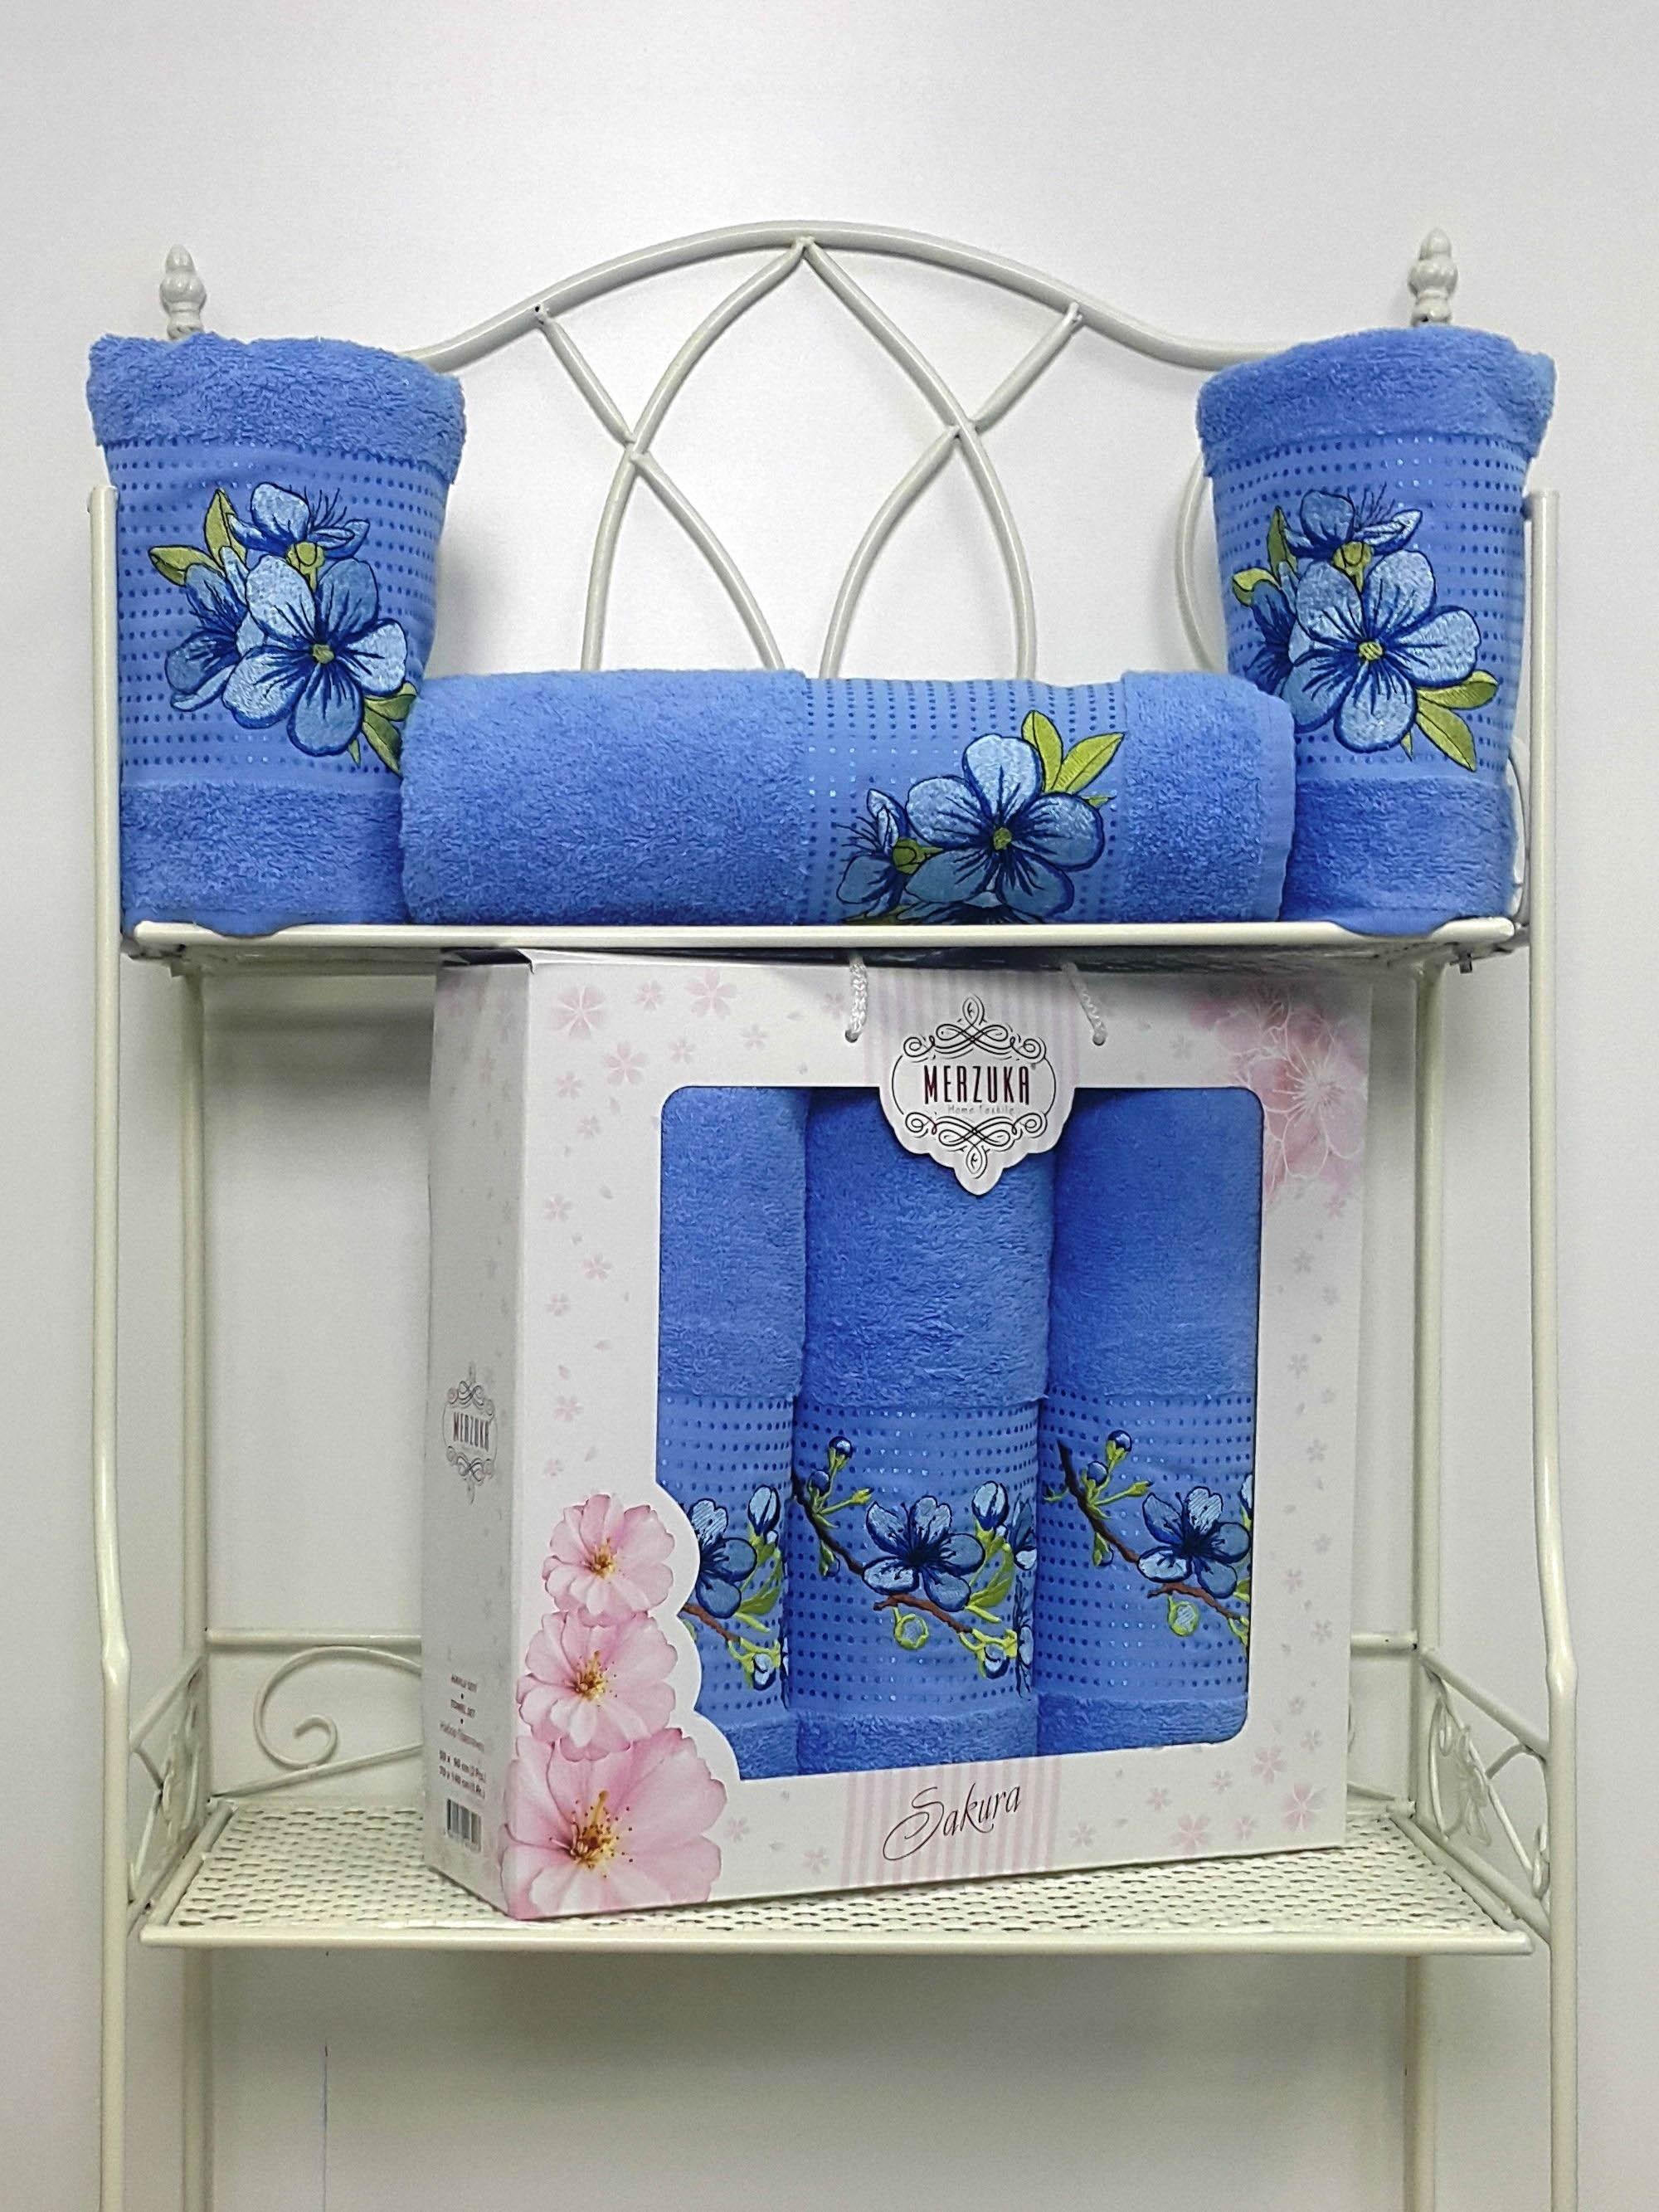 Полотенца Oran Merzuka Полотенце Sakura Цвет: Голубой (Набор) набор из 2 полотенец merzuka sakura 50х90 70х140 8430 голубой